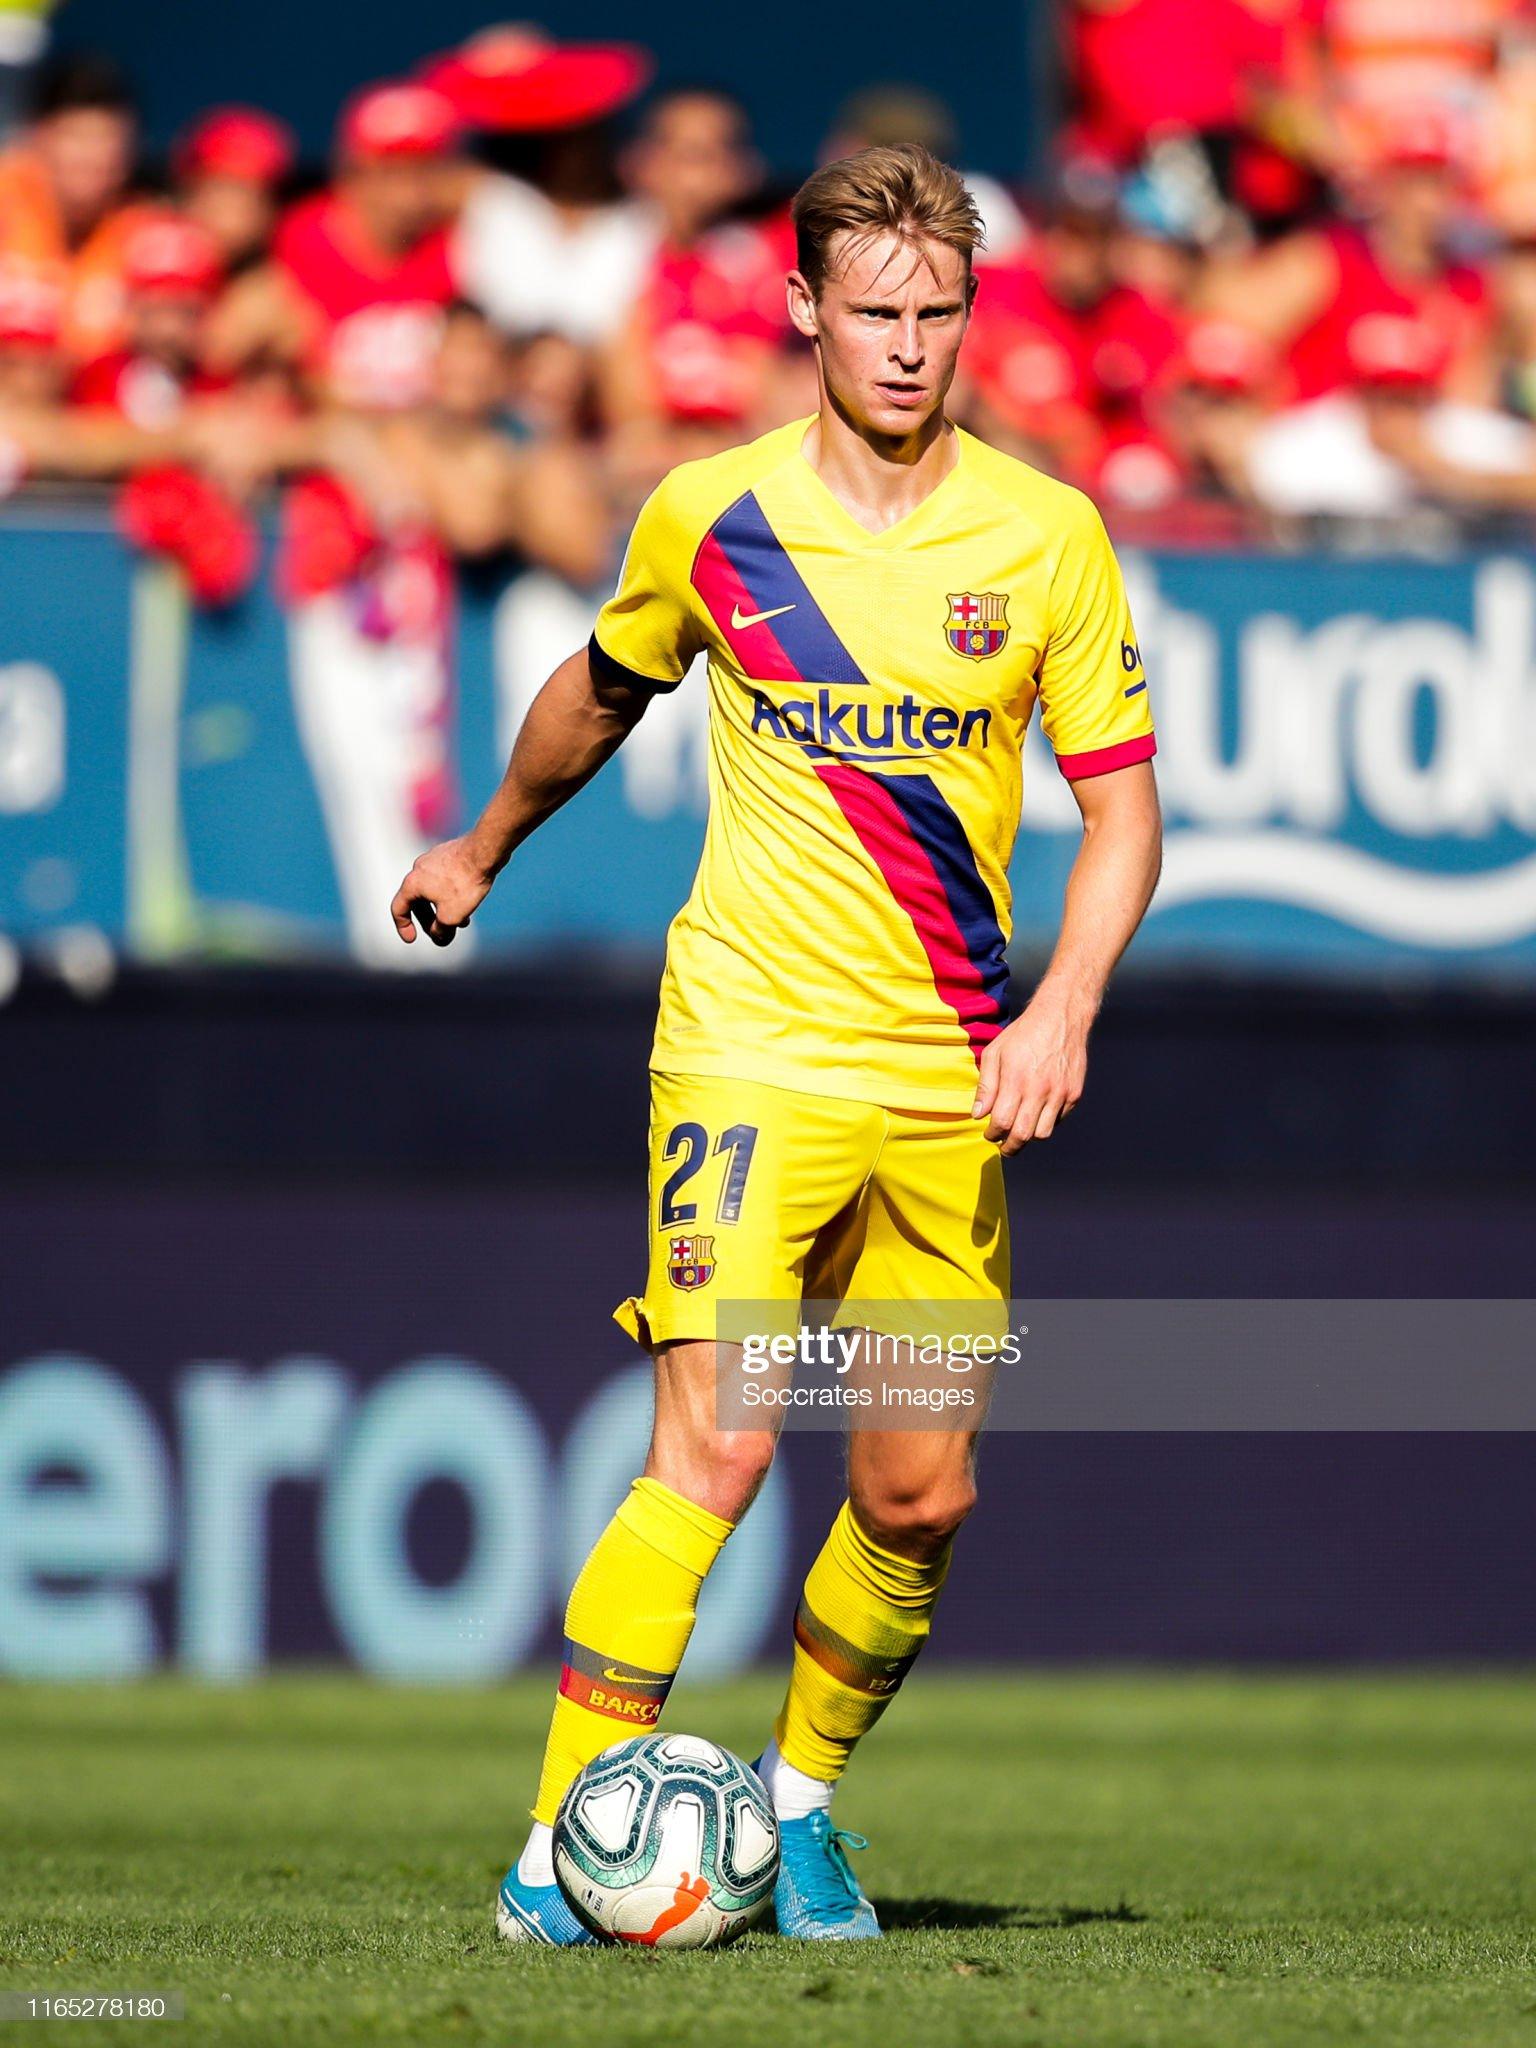 صور مباراة : أوساسونا - برشلونة 2-2 ( 31-08-2019 )  Frenkie-de-jong-of-fc-barcelona-during-the-la-liga-santander-match-picture-id1165278180?s=2048x2048